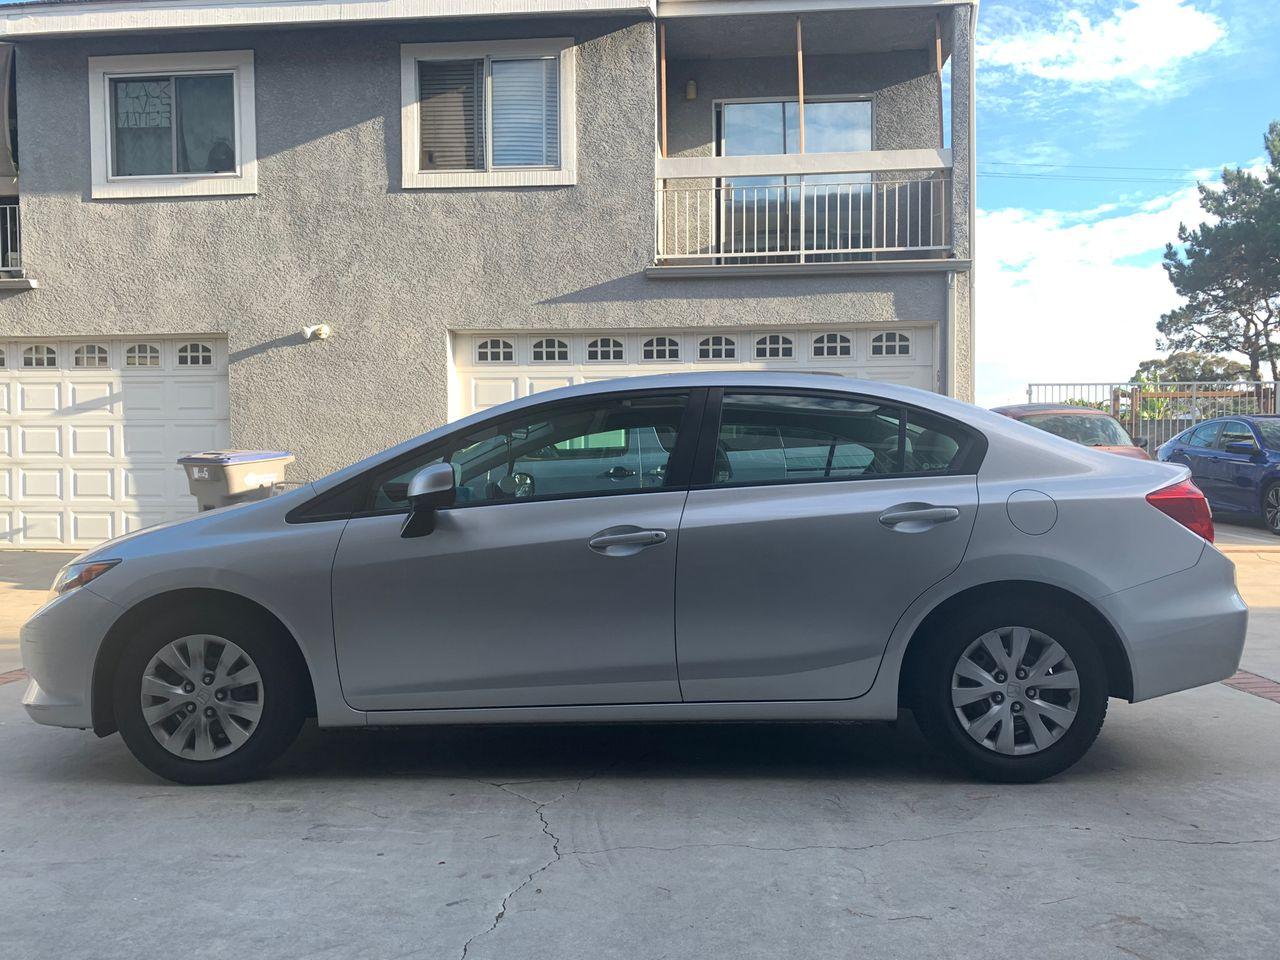 2012 Honda Civic LX | Carson, CA, Urban Titanium Metallic (Gray), Front Wheel